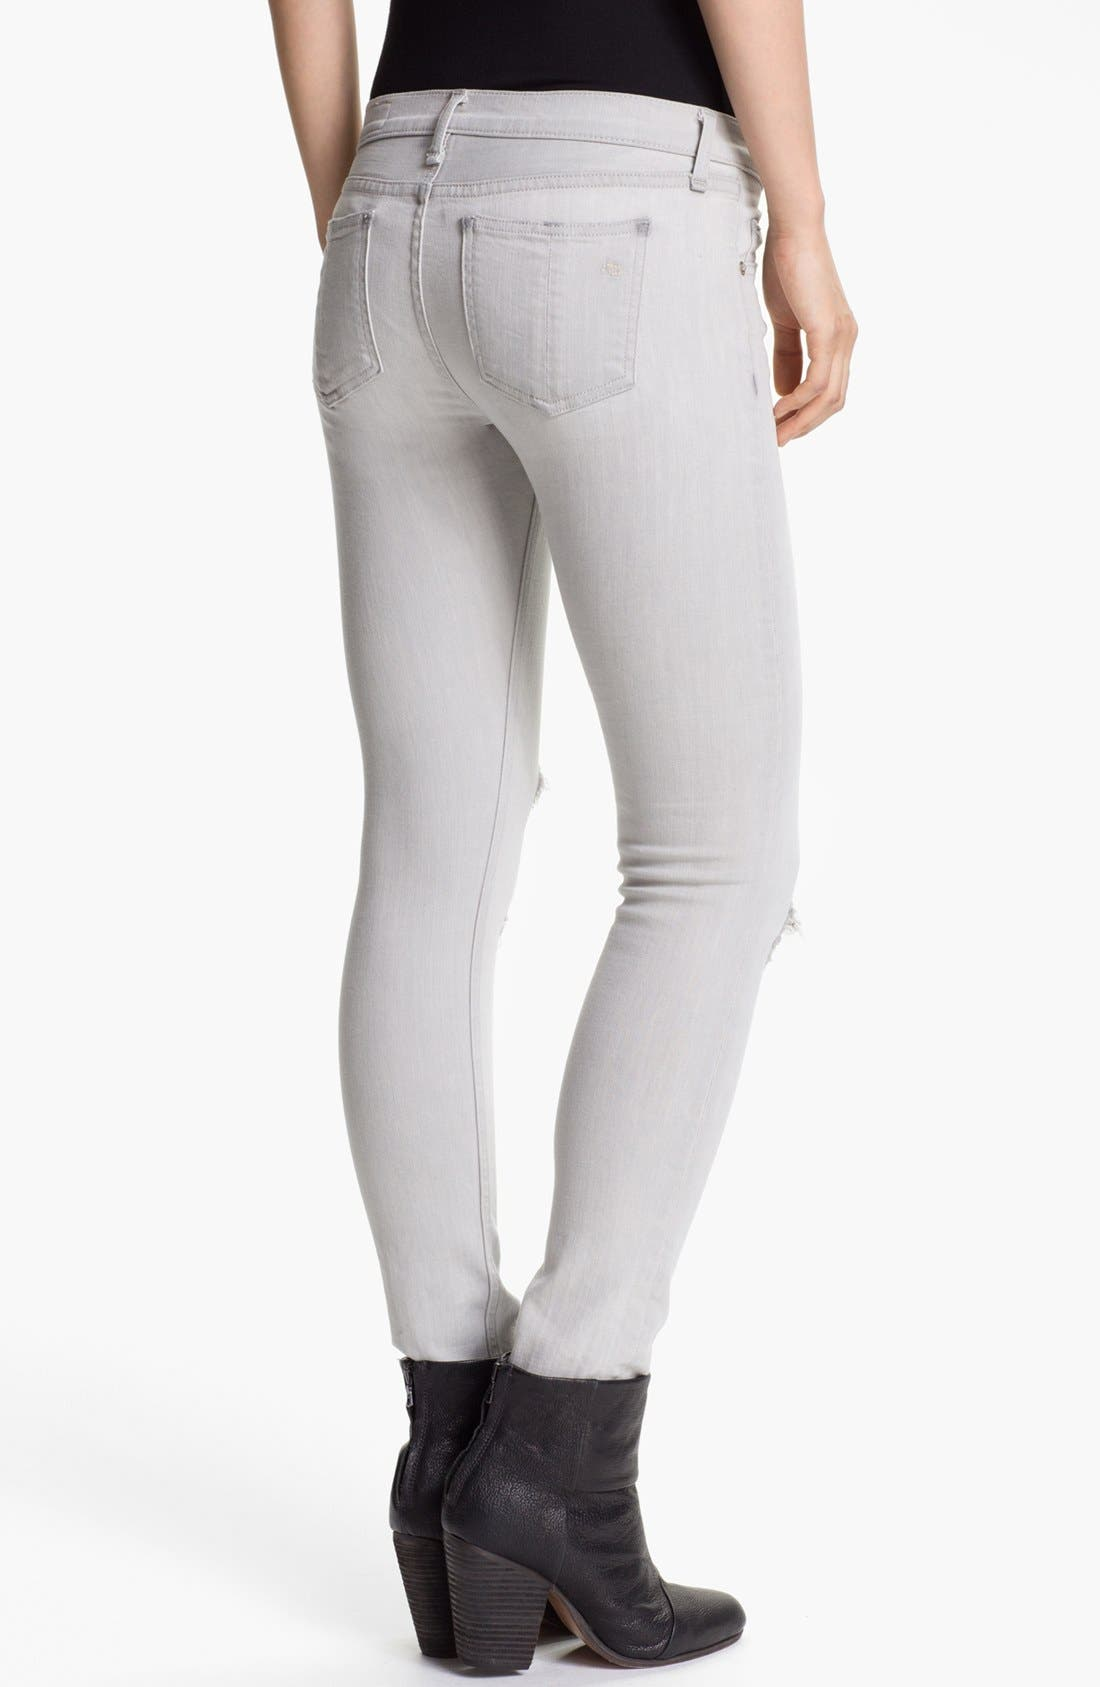 Alternate Image 2  - rag & bone/JEAN 'The Skinny' Stretch Jeans (Surrey)